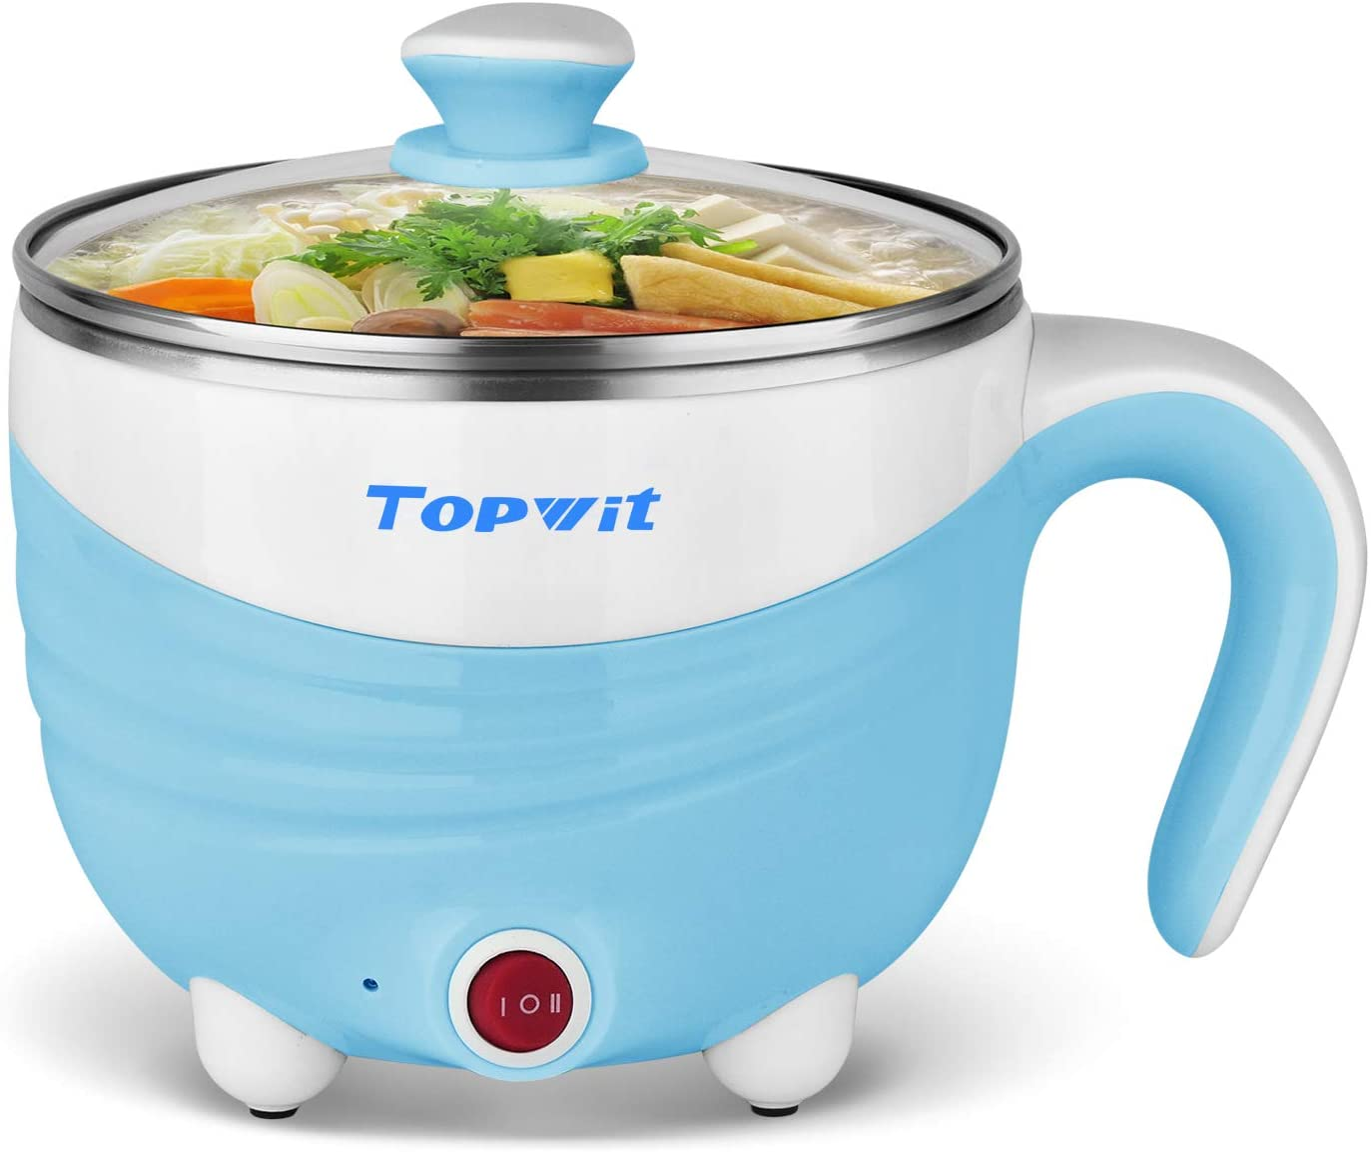 Electric Hot Pot 1.5L, Rapid Noodles Cooker, Mini Pot, Cook Perfect for Ramen, Egg, Pasta, Dumplings, Soup, Porridge, Oatmeal, Blue – A Must Have Cooker For Student Topwit